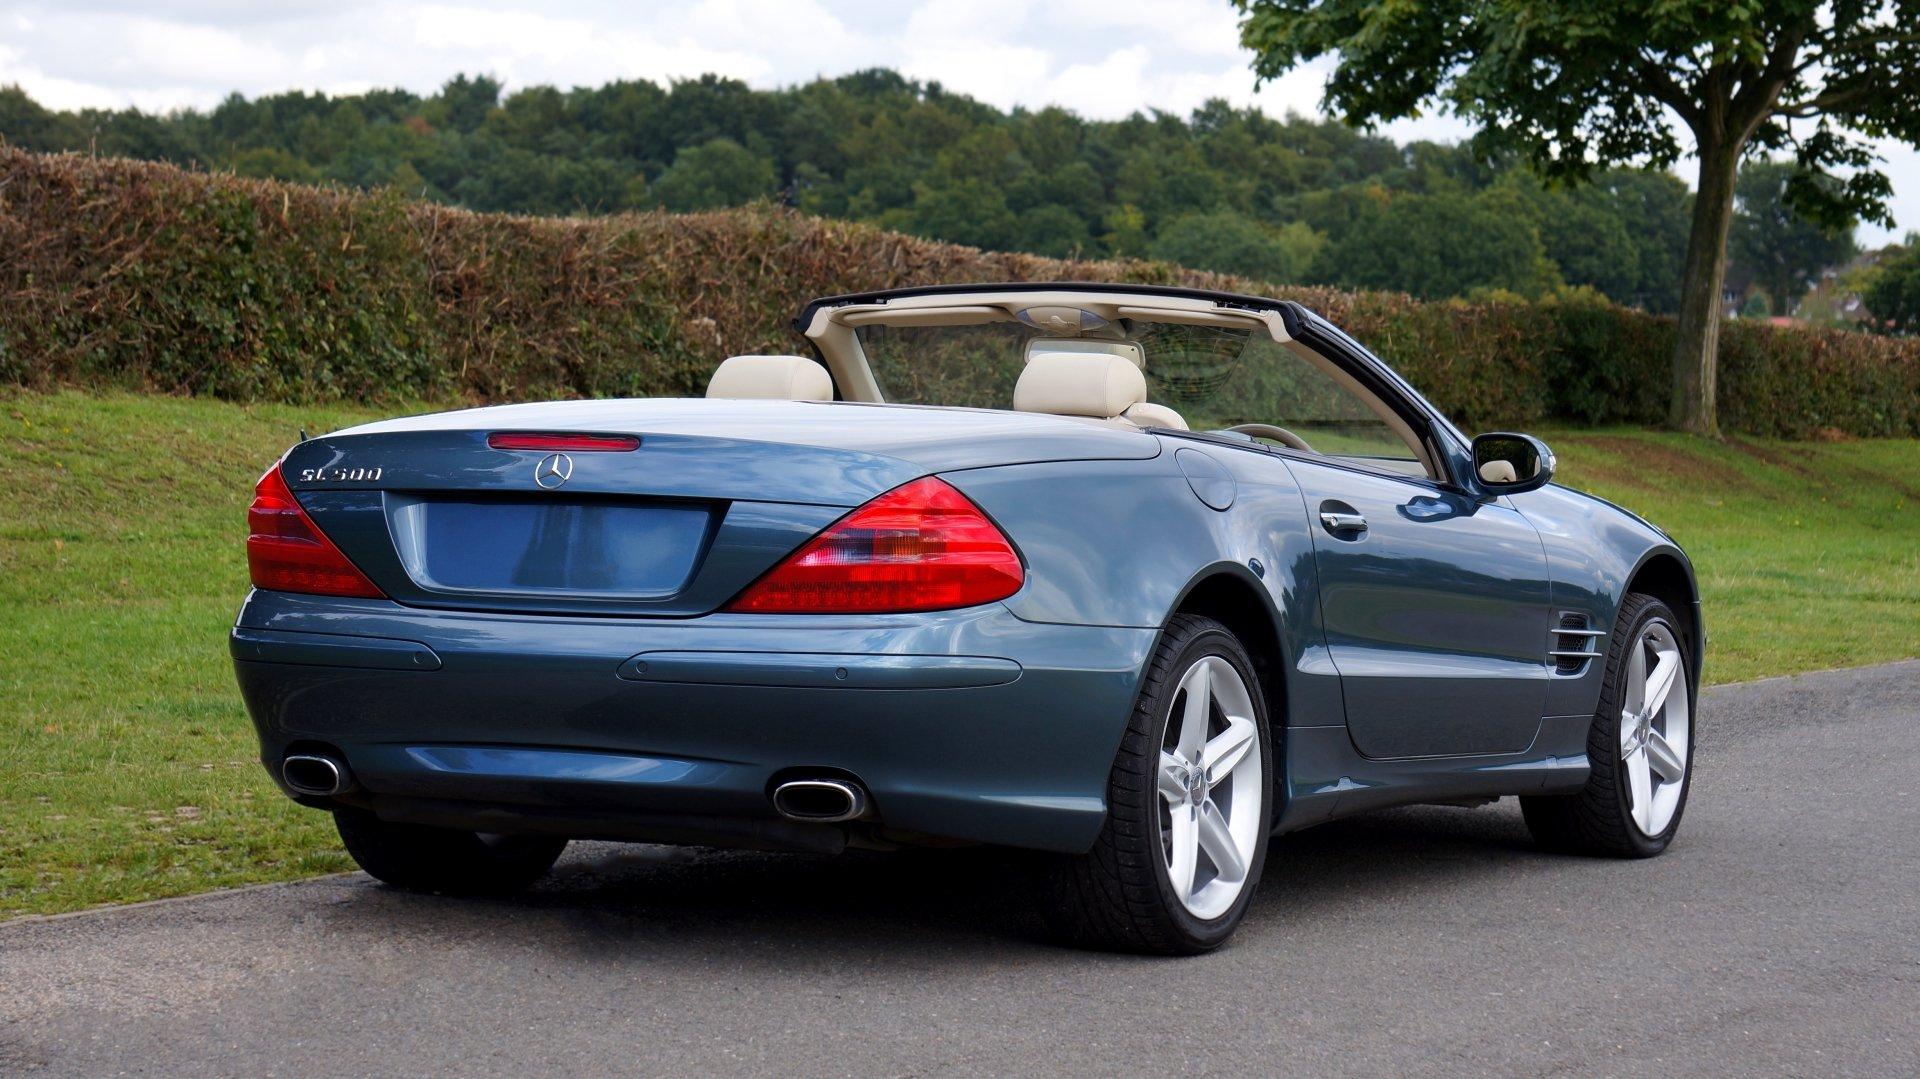 Blue Mercedes-Benz SL500 4k Ultra HD Wallpaper ...